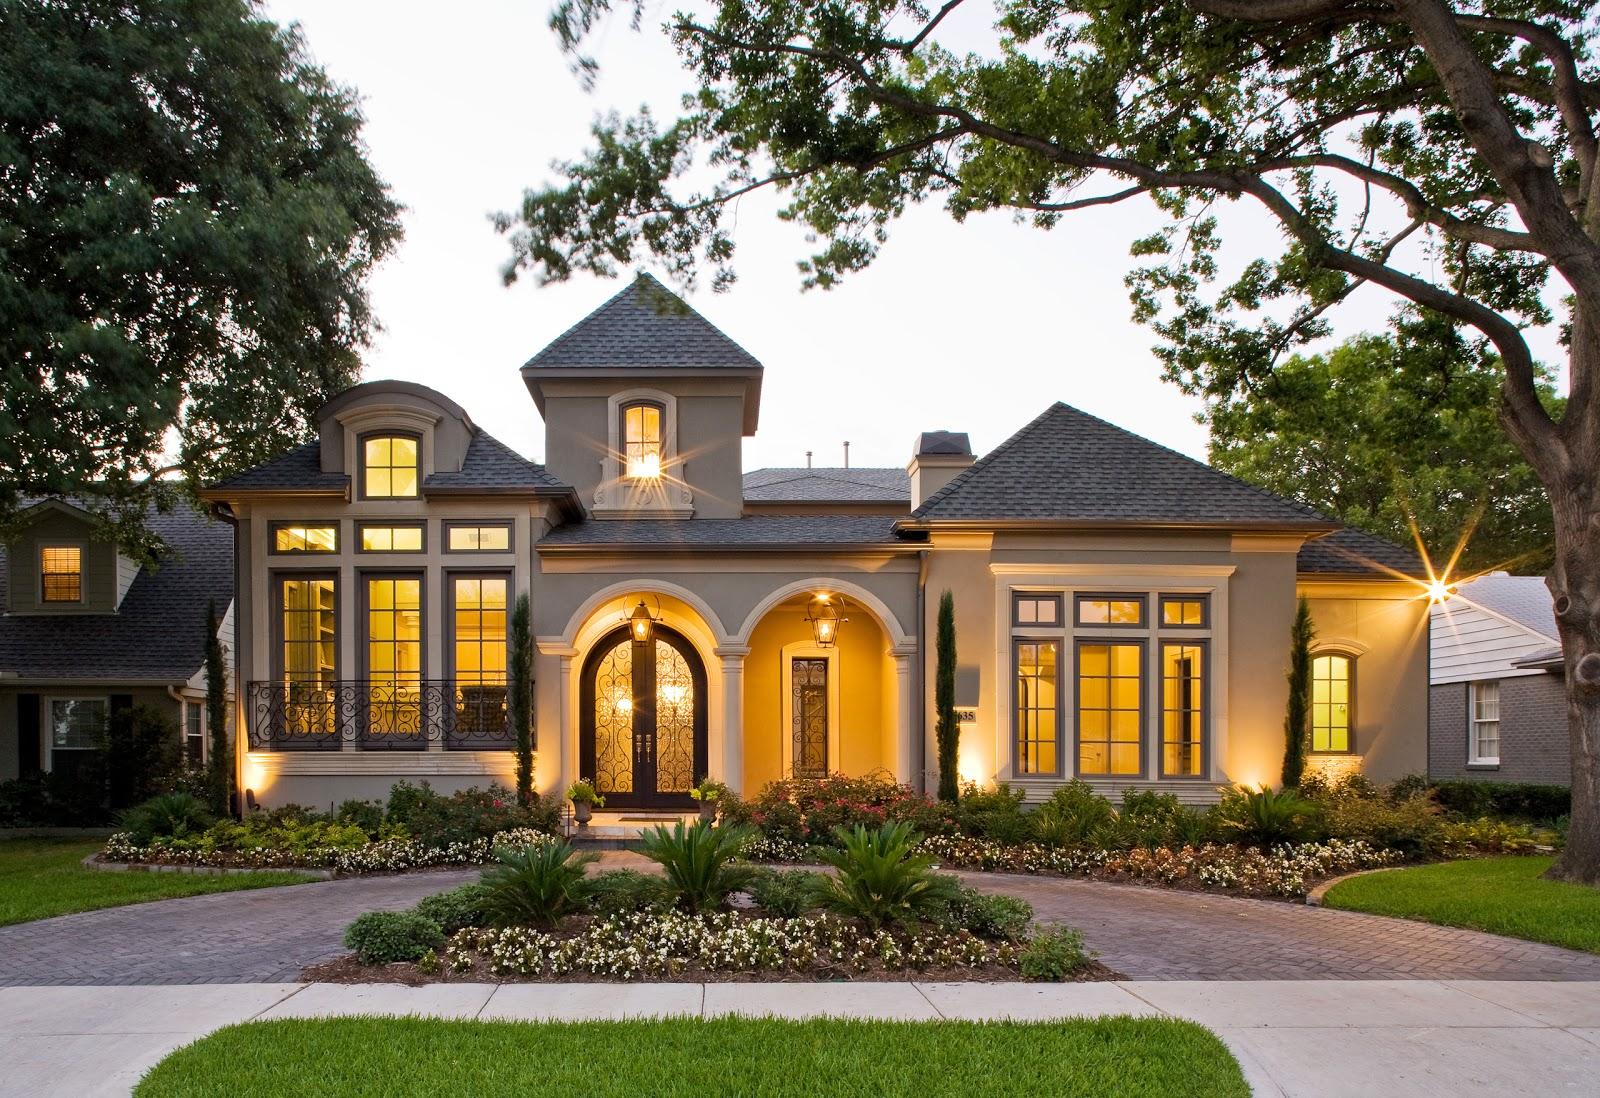 Home Design Ideas Pictures: Exterior Paint House Pictures